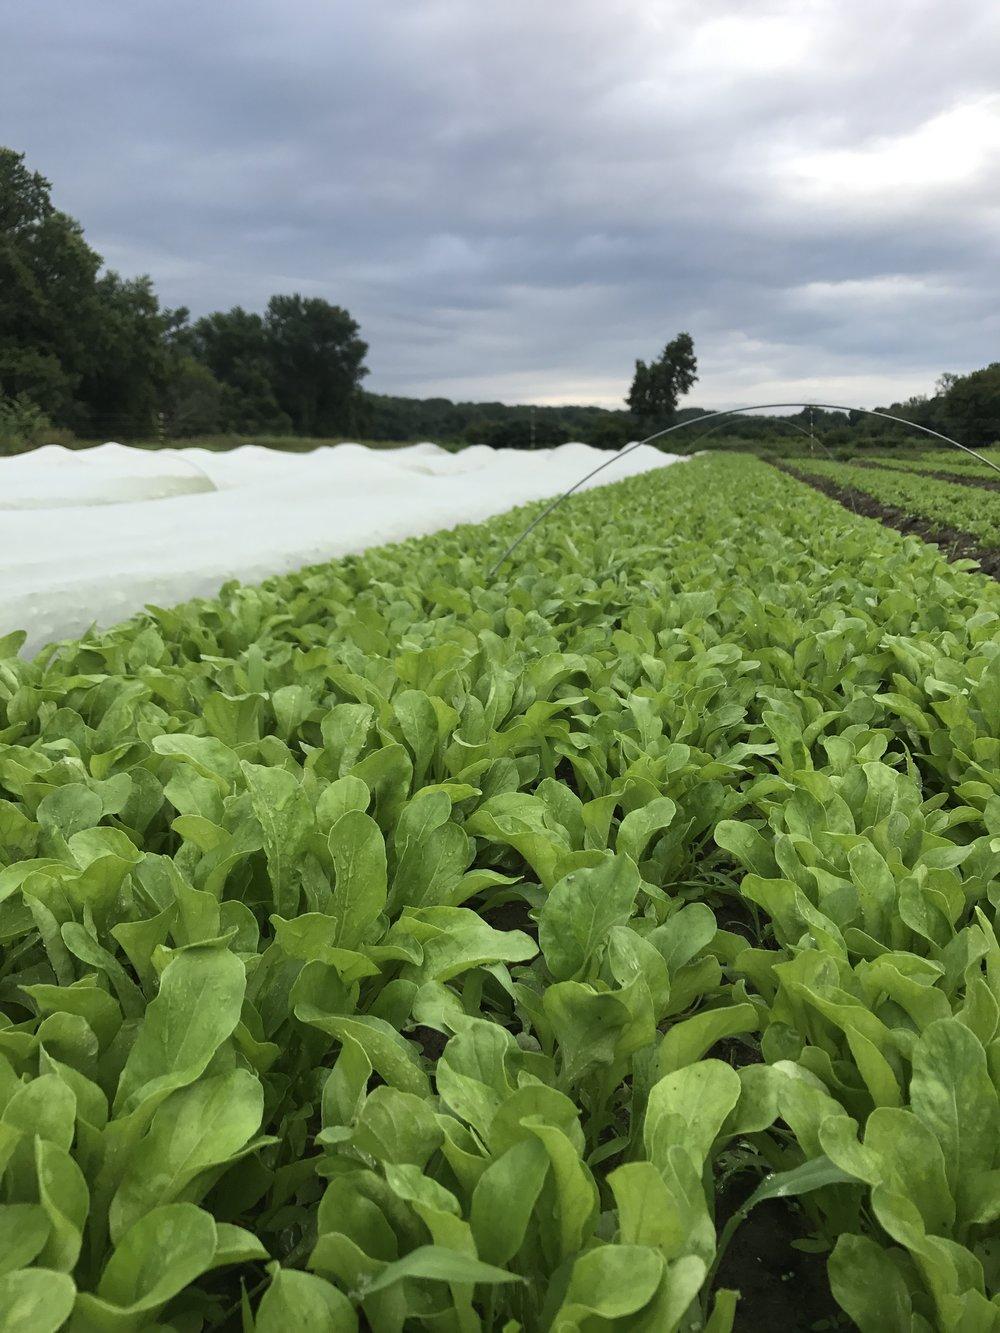 pitchfork farm grows the food -